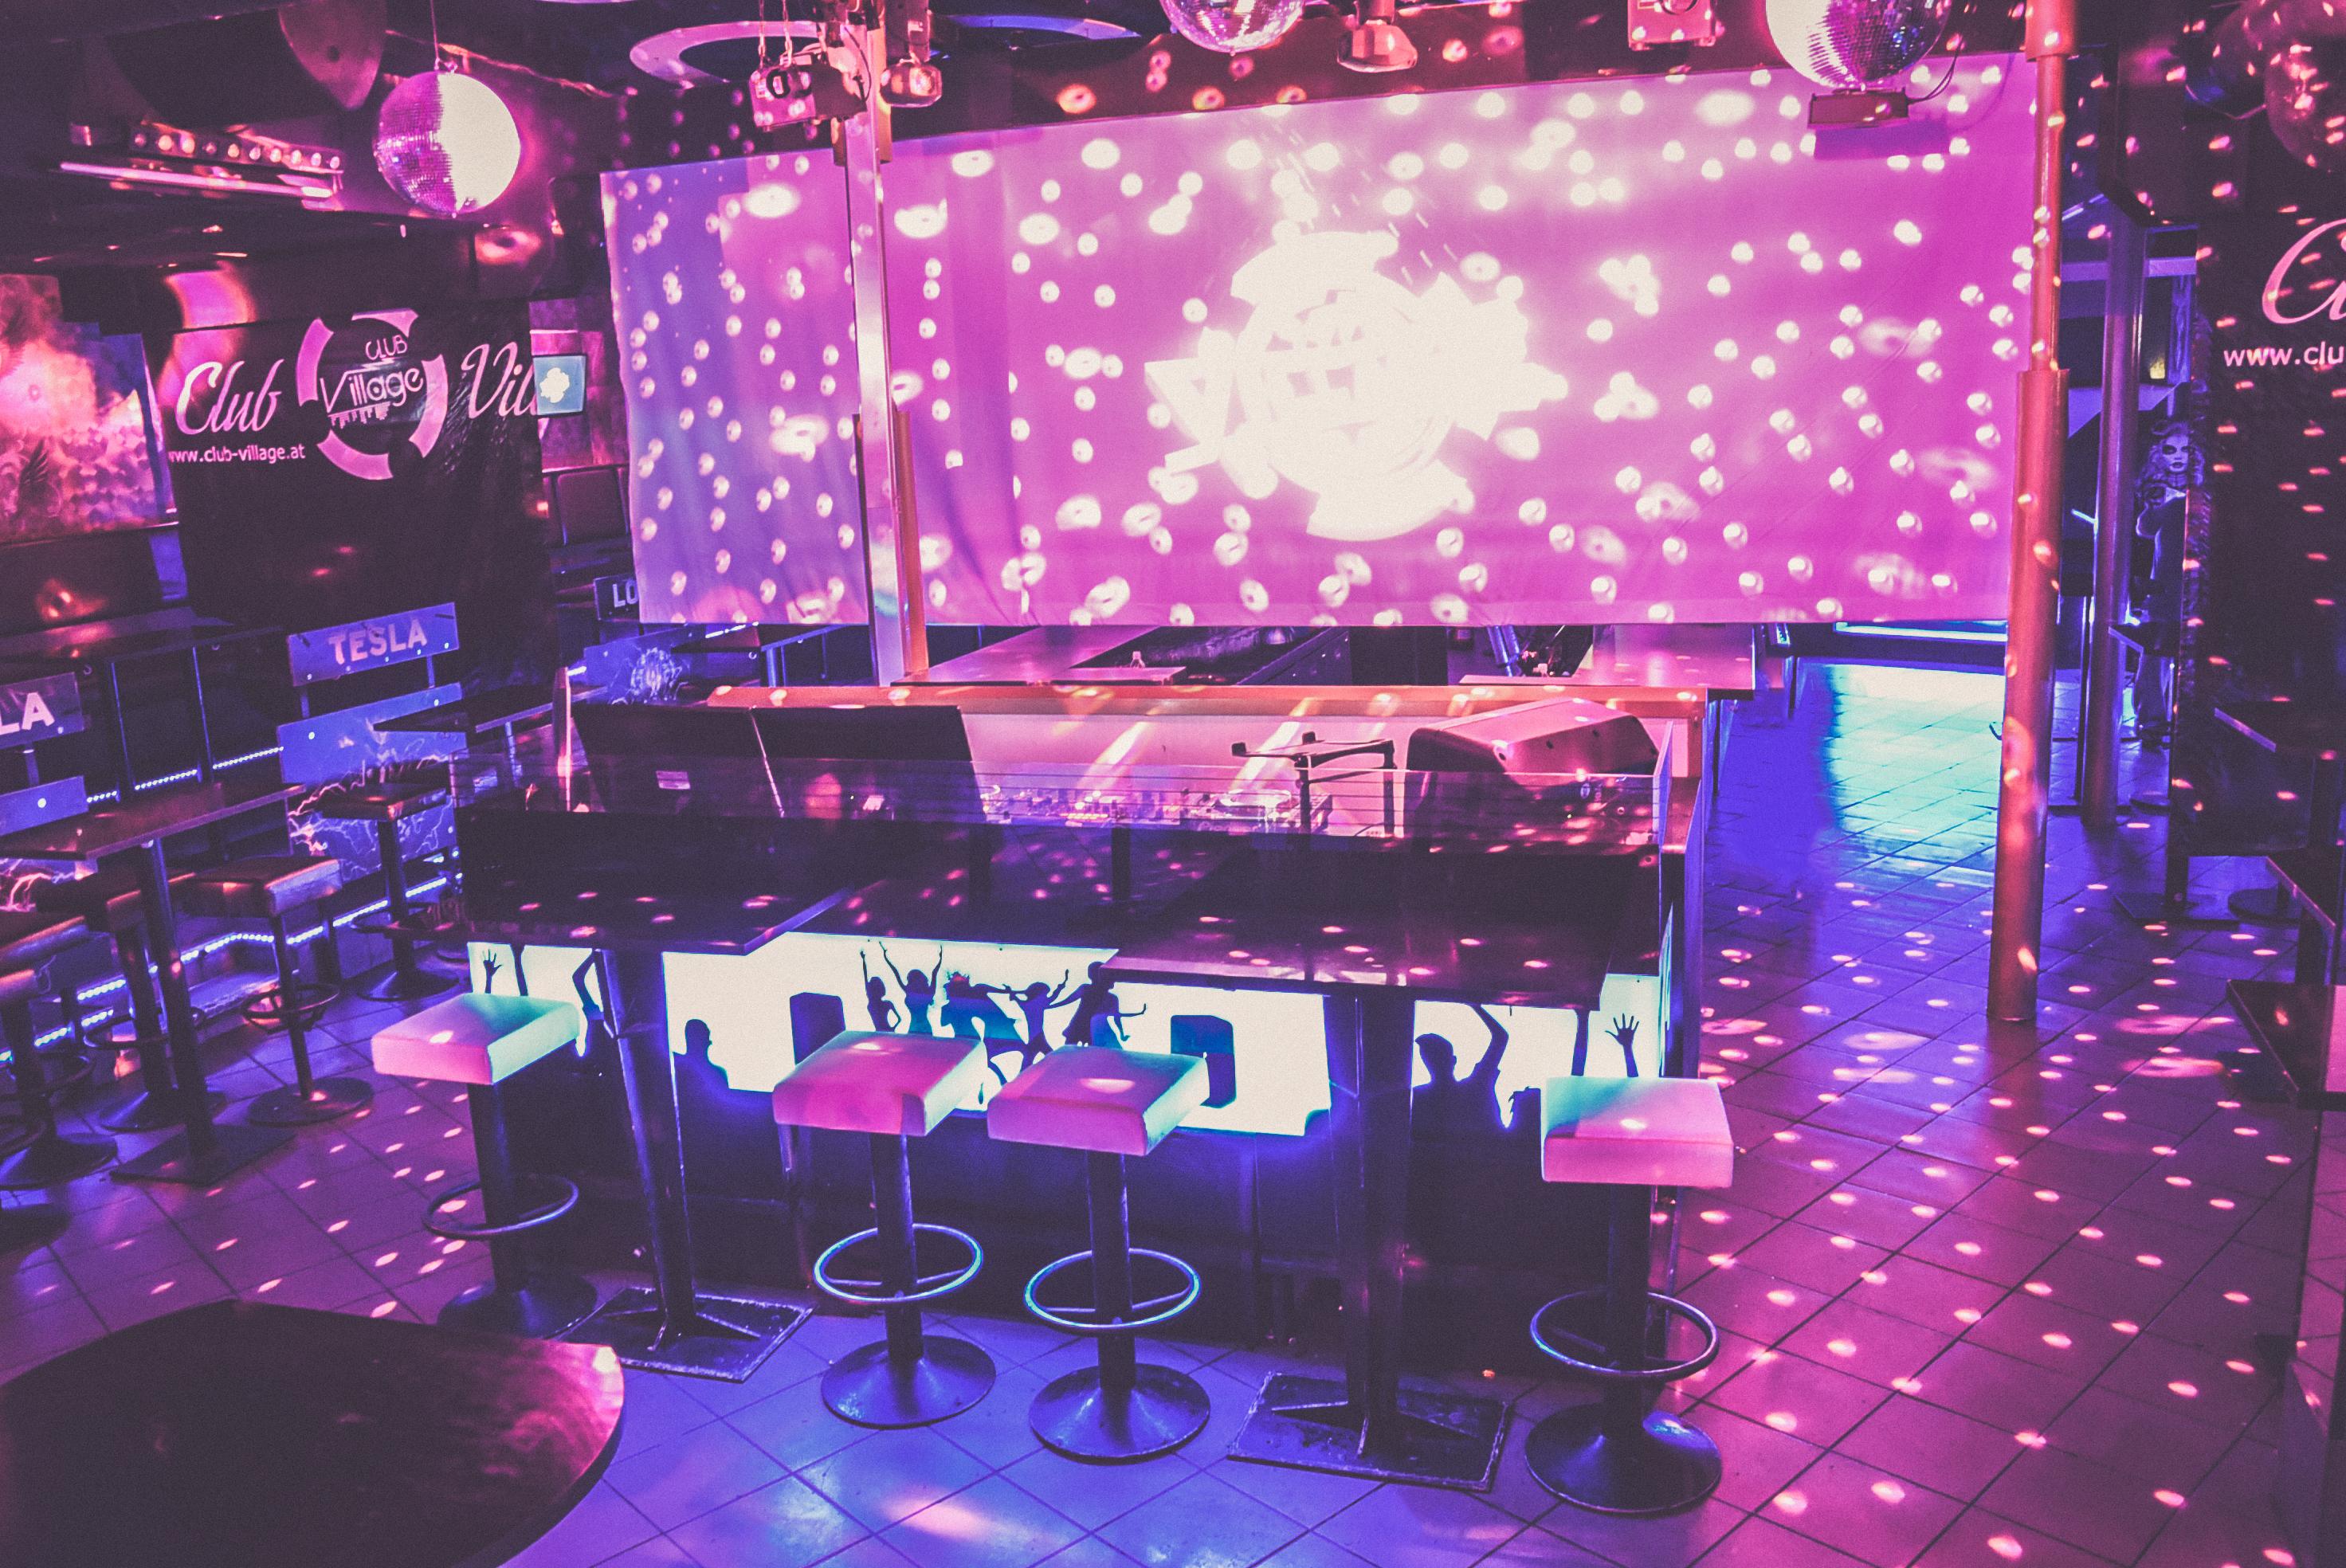 club village - Photo